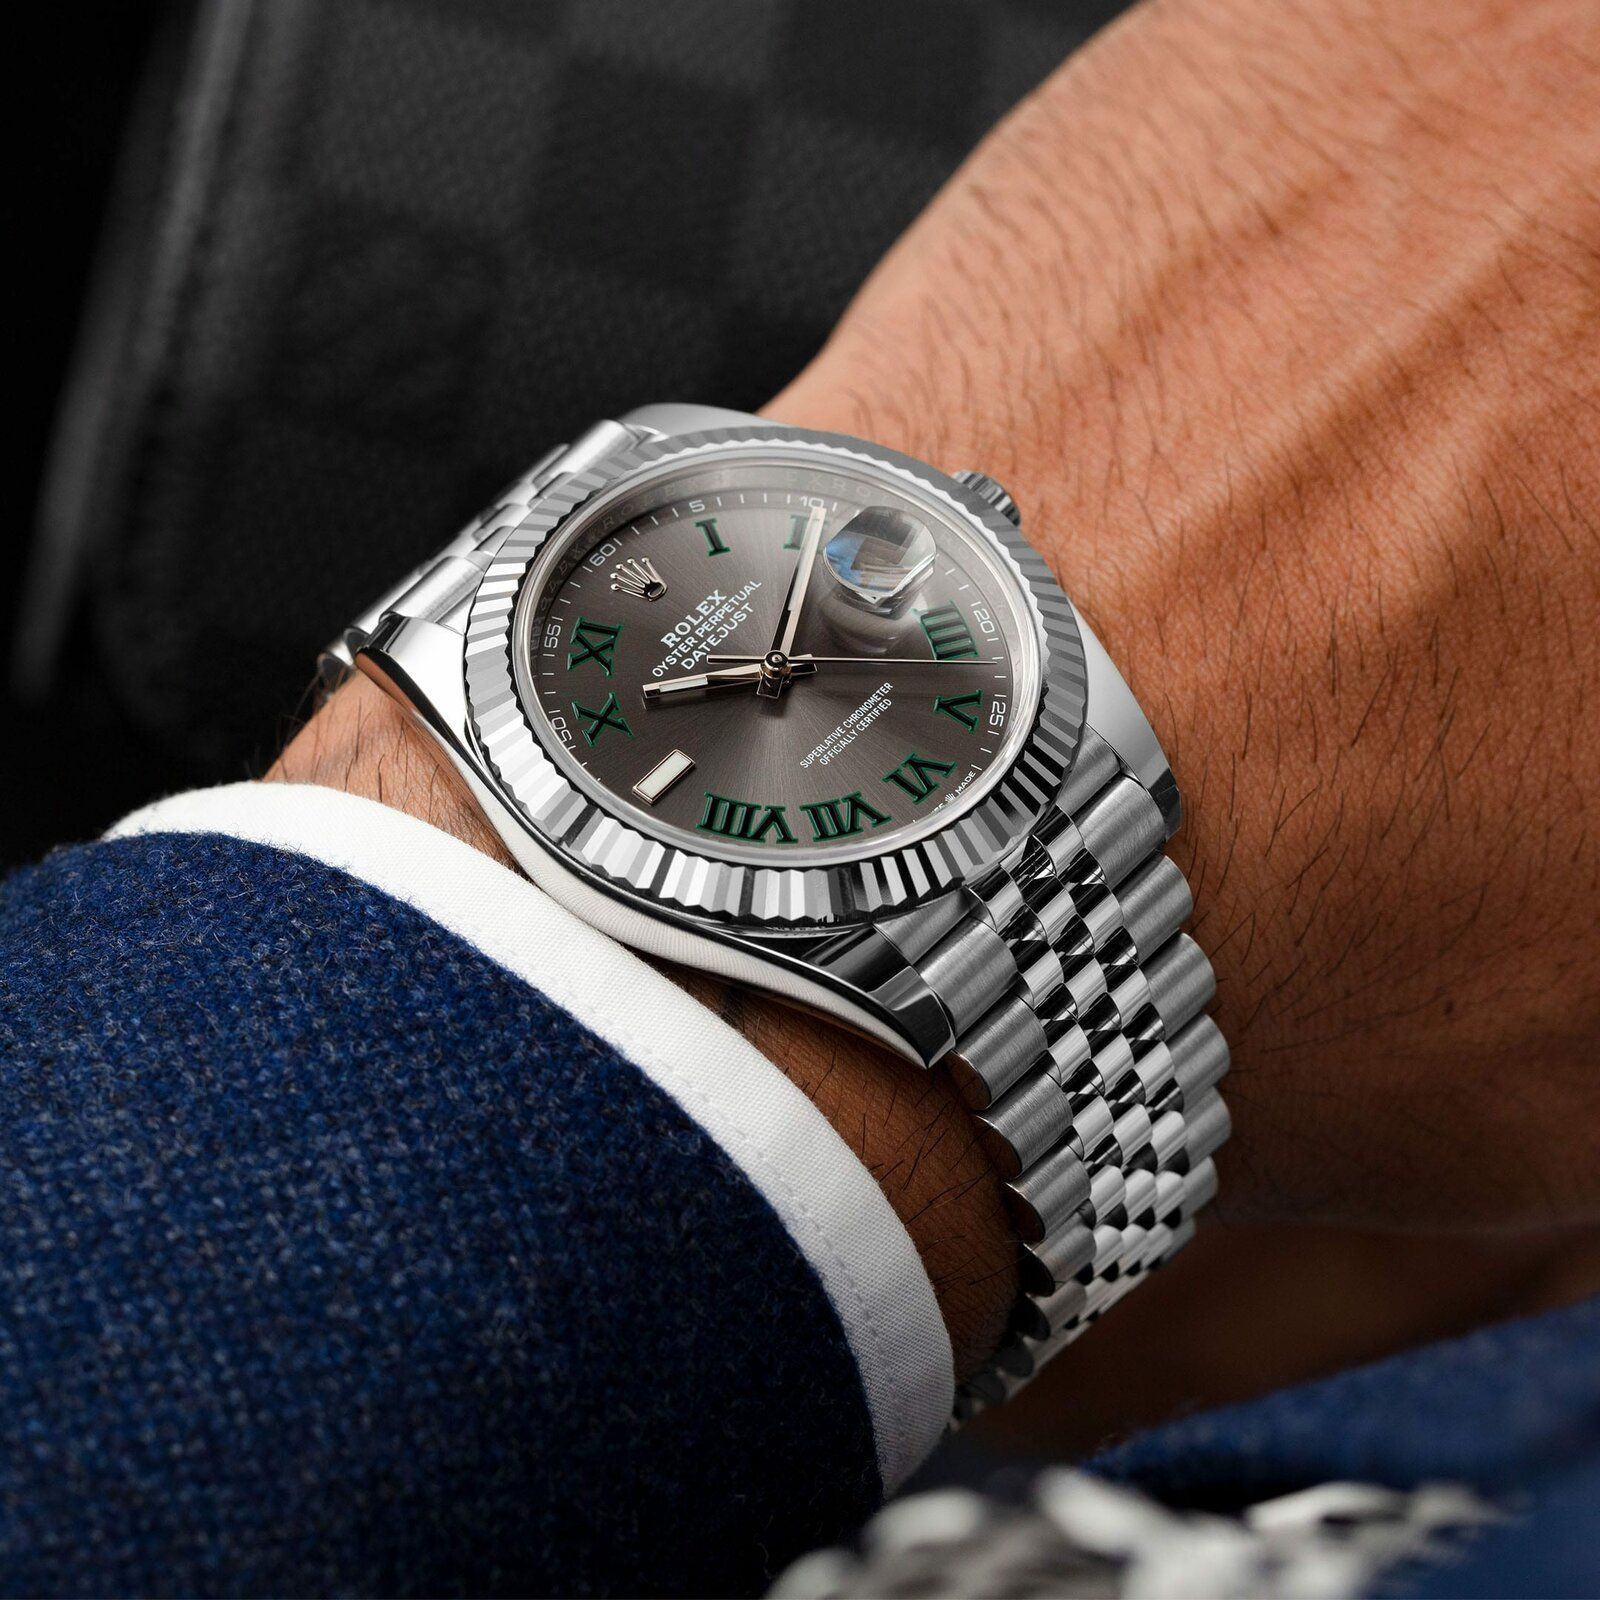 WTC_Rolex-Datejust-41-Wimbledon-Jubilee_126333_lifestyle.jpg